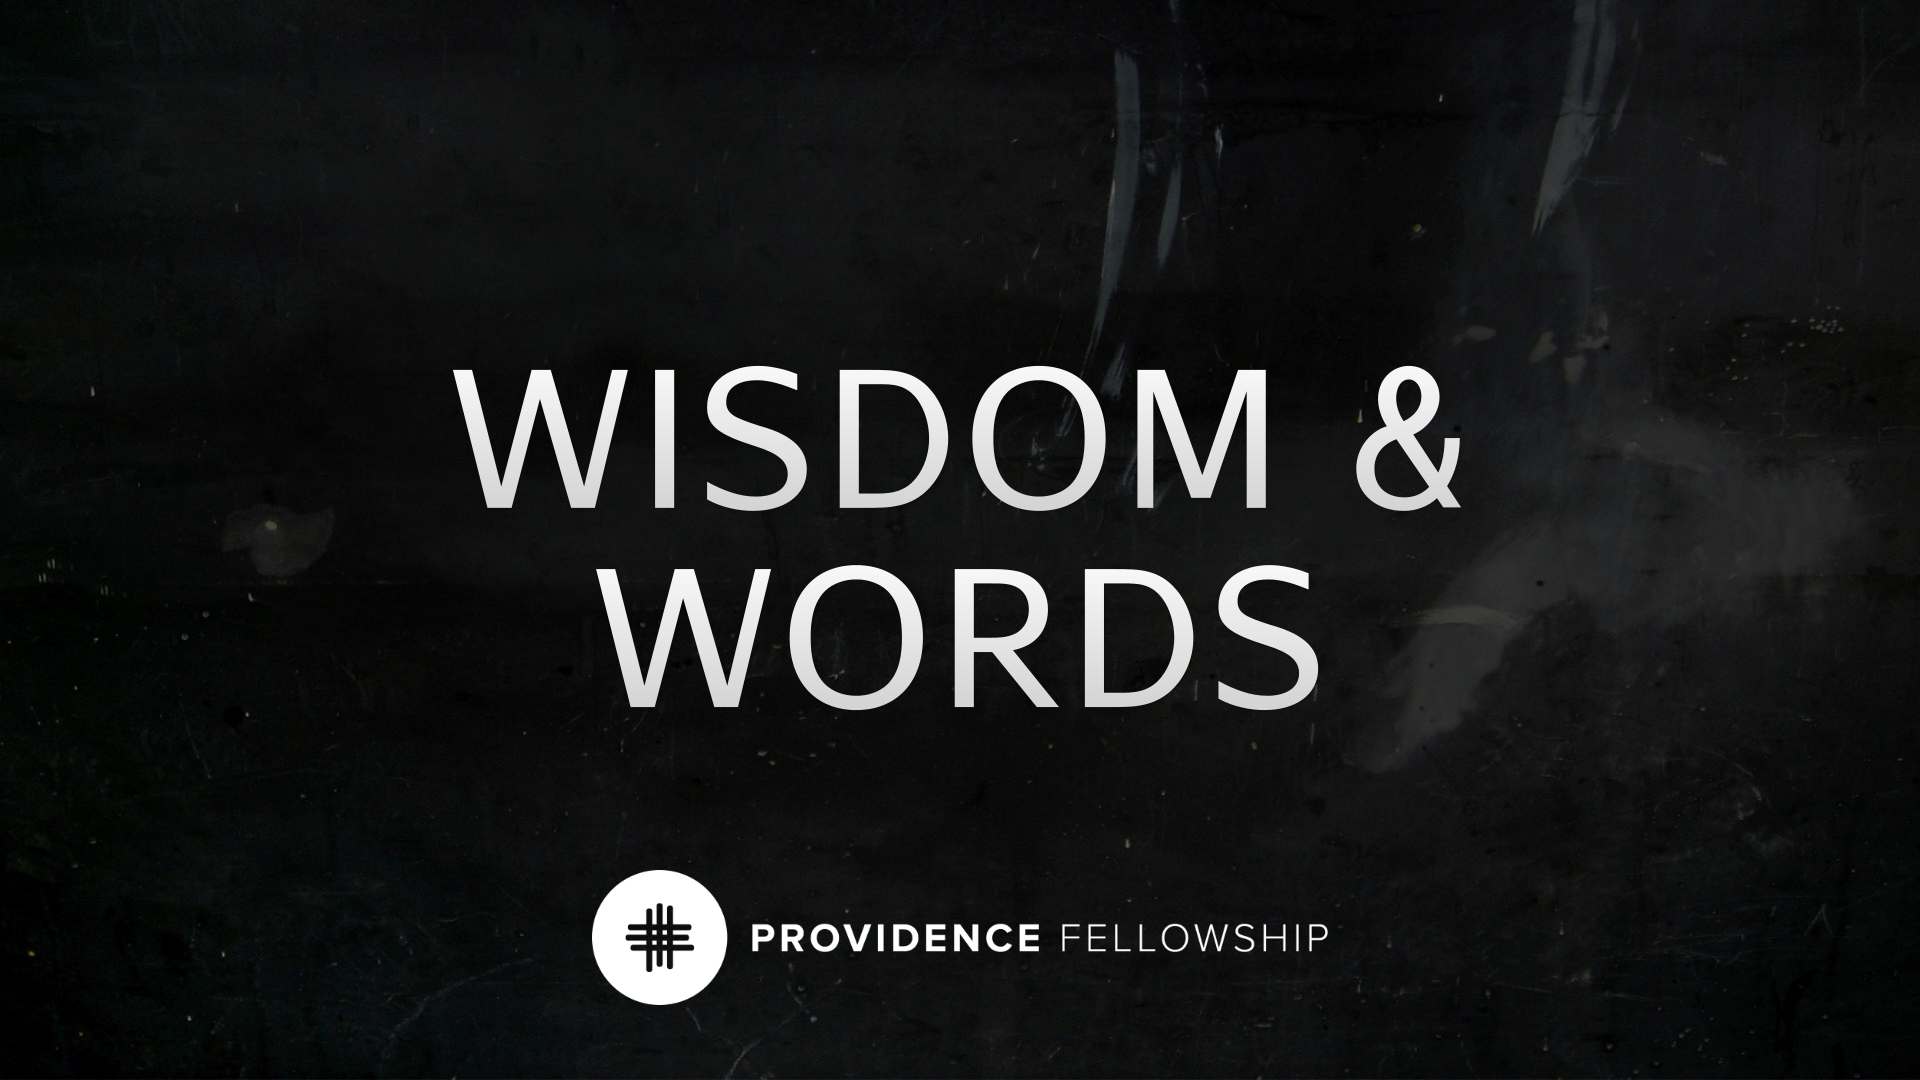 Wisdom & Words - Proverbs 12:18Chad Cronin